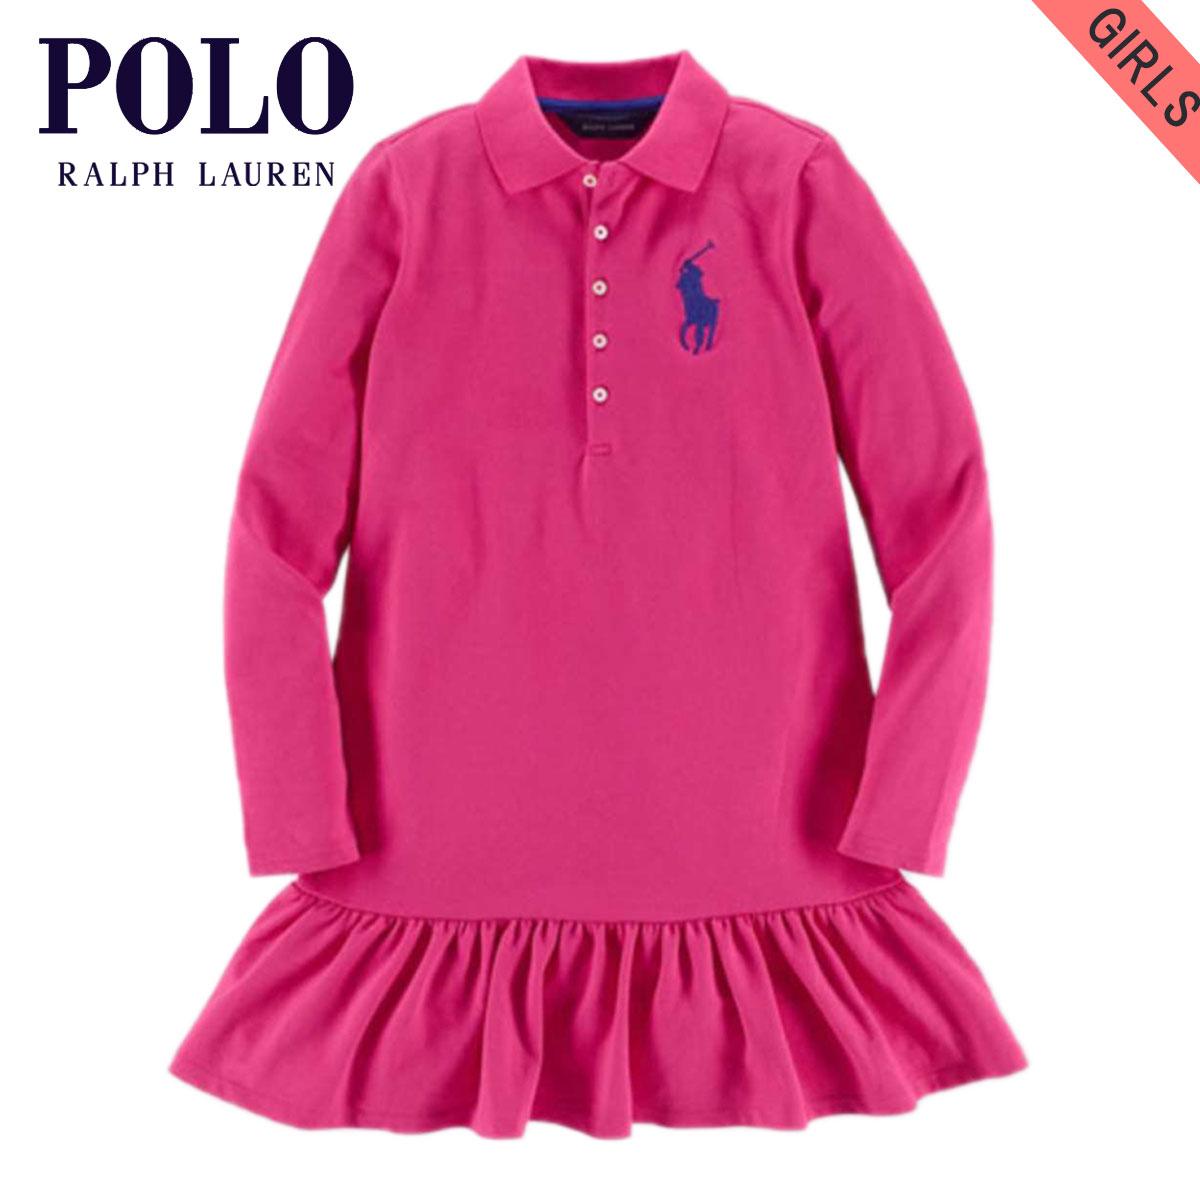 1f05e75b47da Poloralflorenkids POLO RALPH LAUREN CHILDREN genuine kids clothing girls  polo shirt BIG PONY COTTON DRESS 40925606